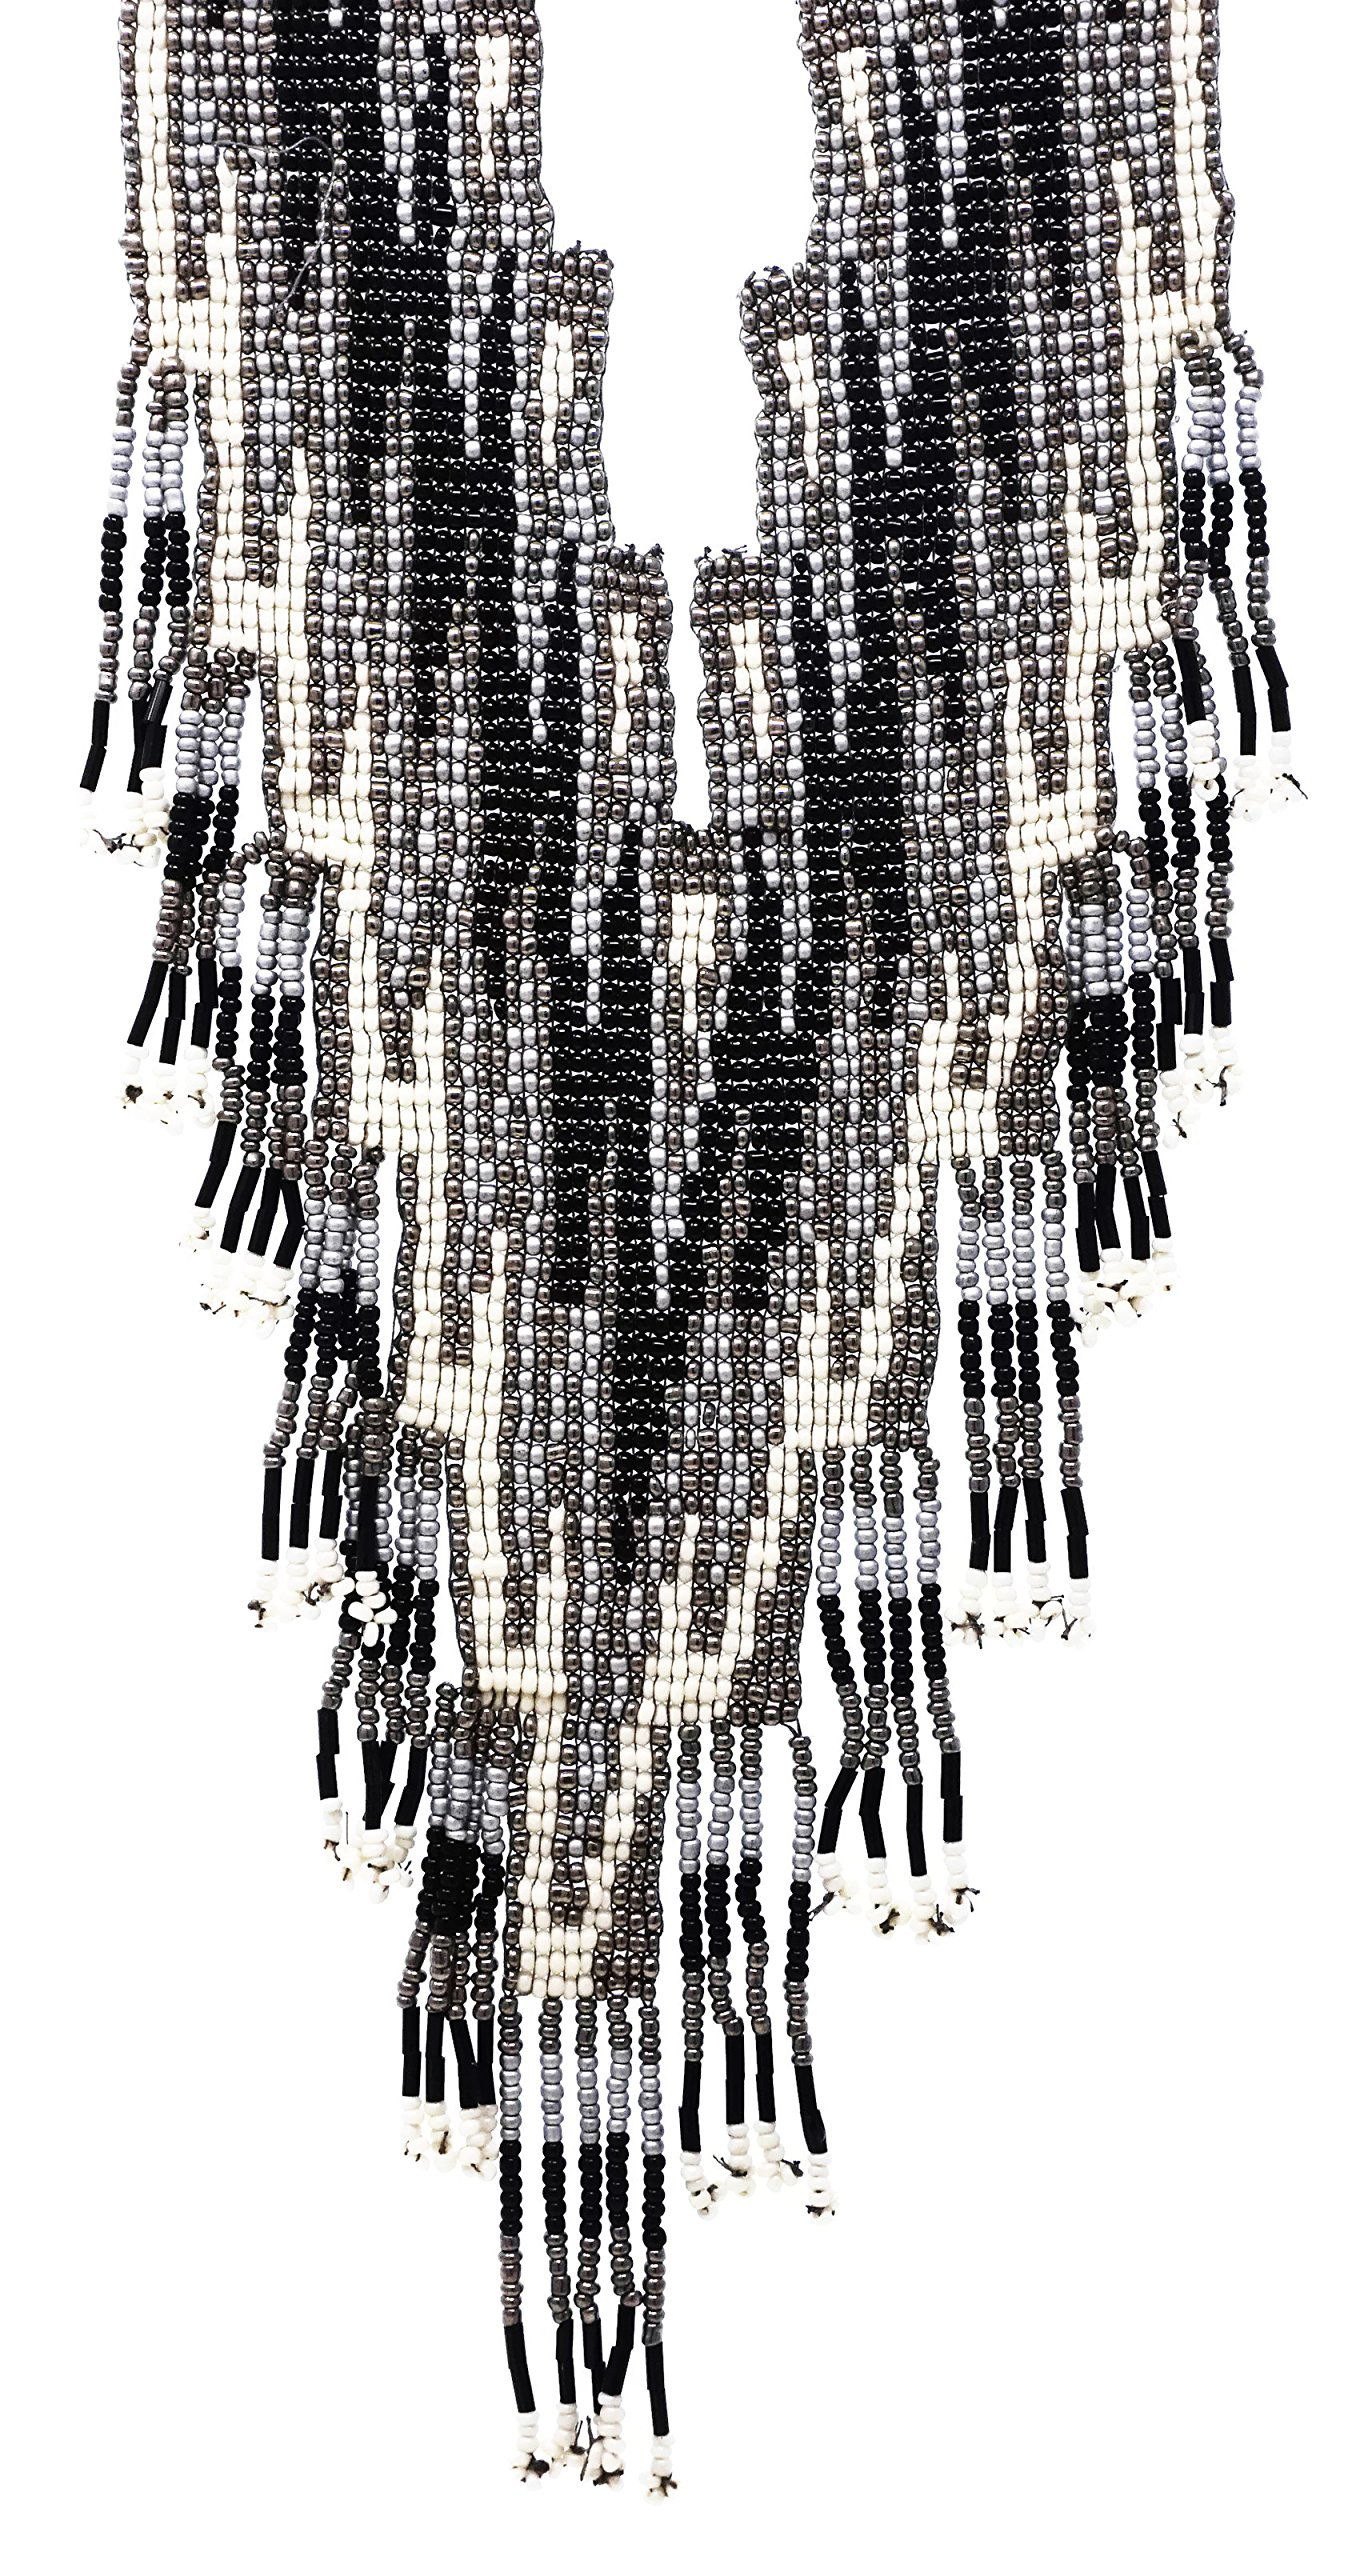 Elosee Bohemian Style Seed Bead Fringe Bib Statement 19'' Necklace